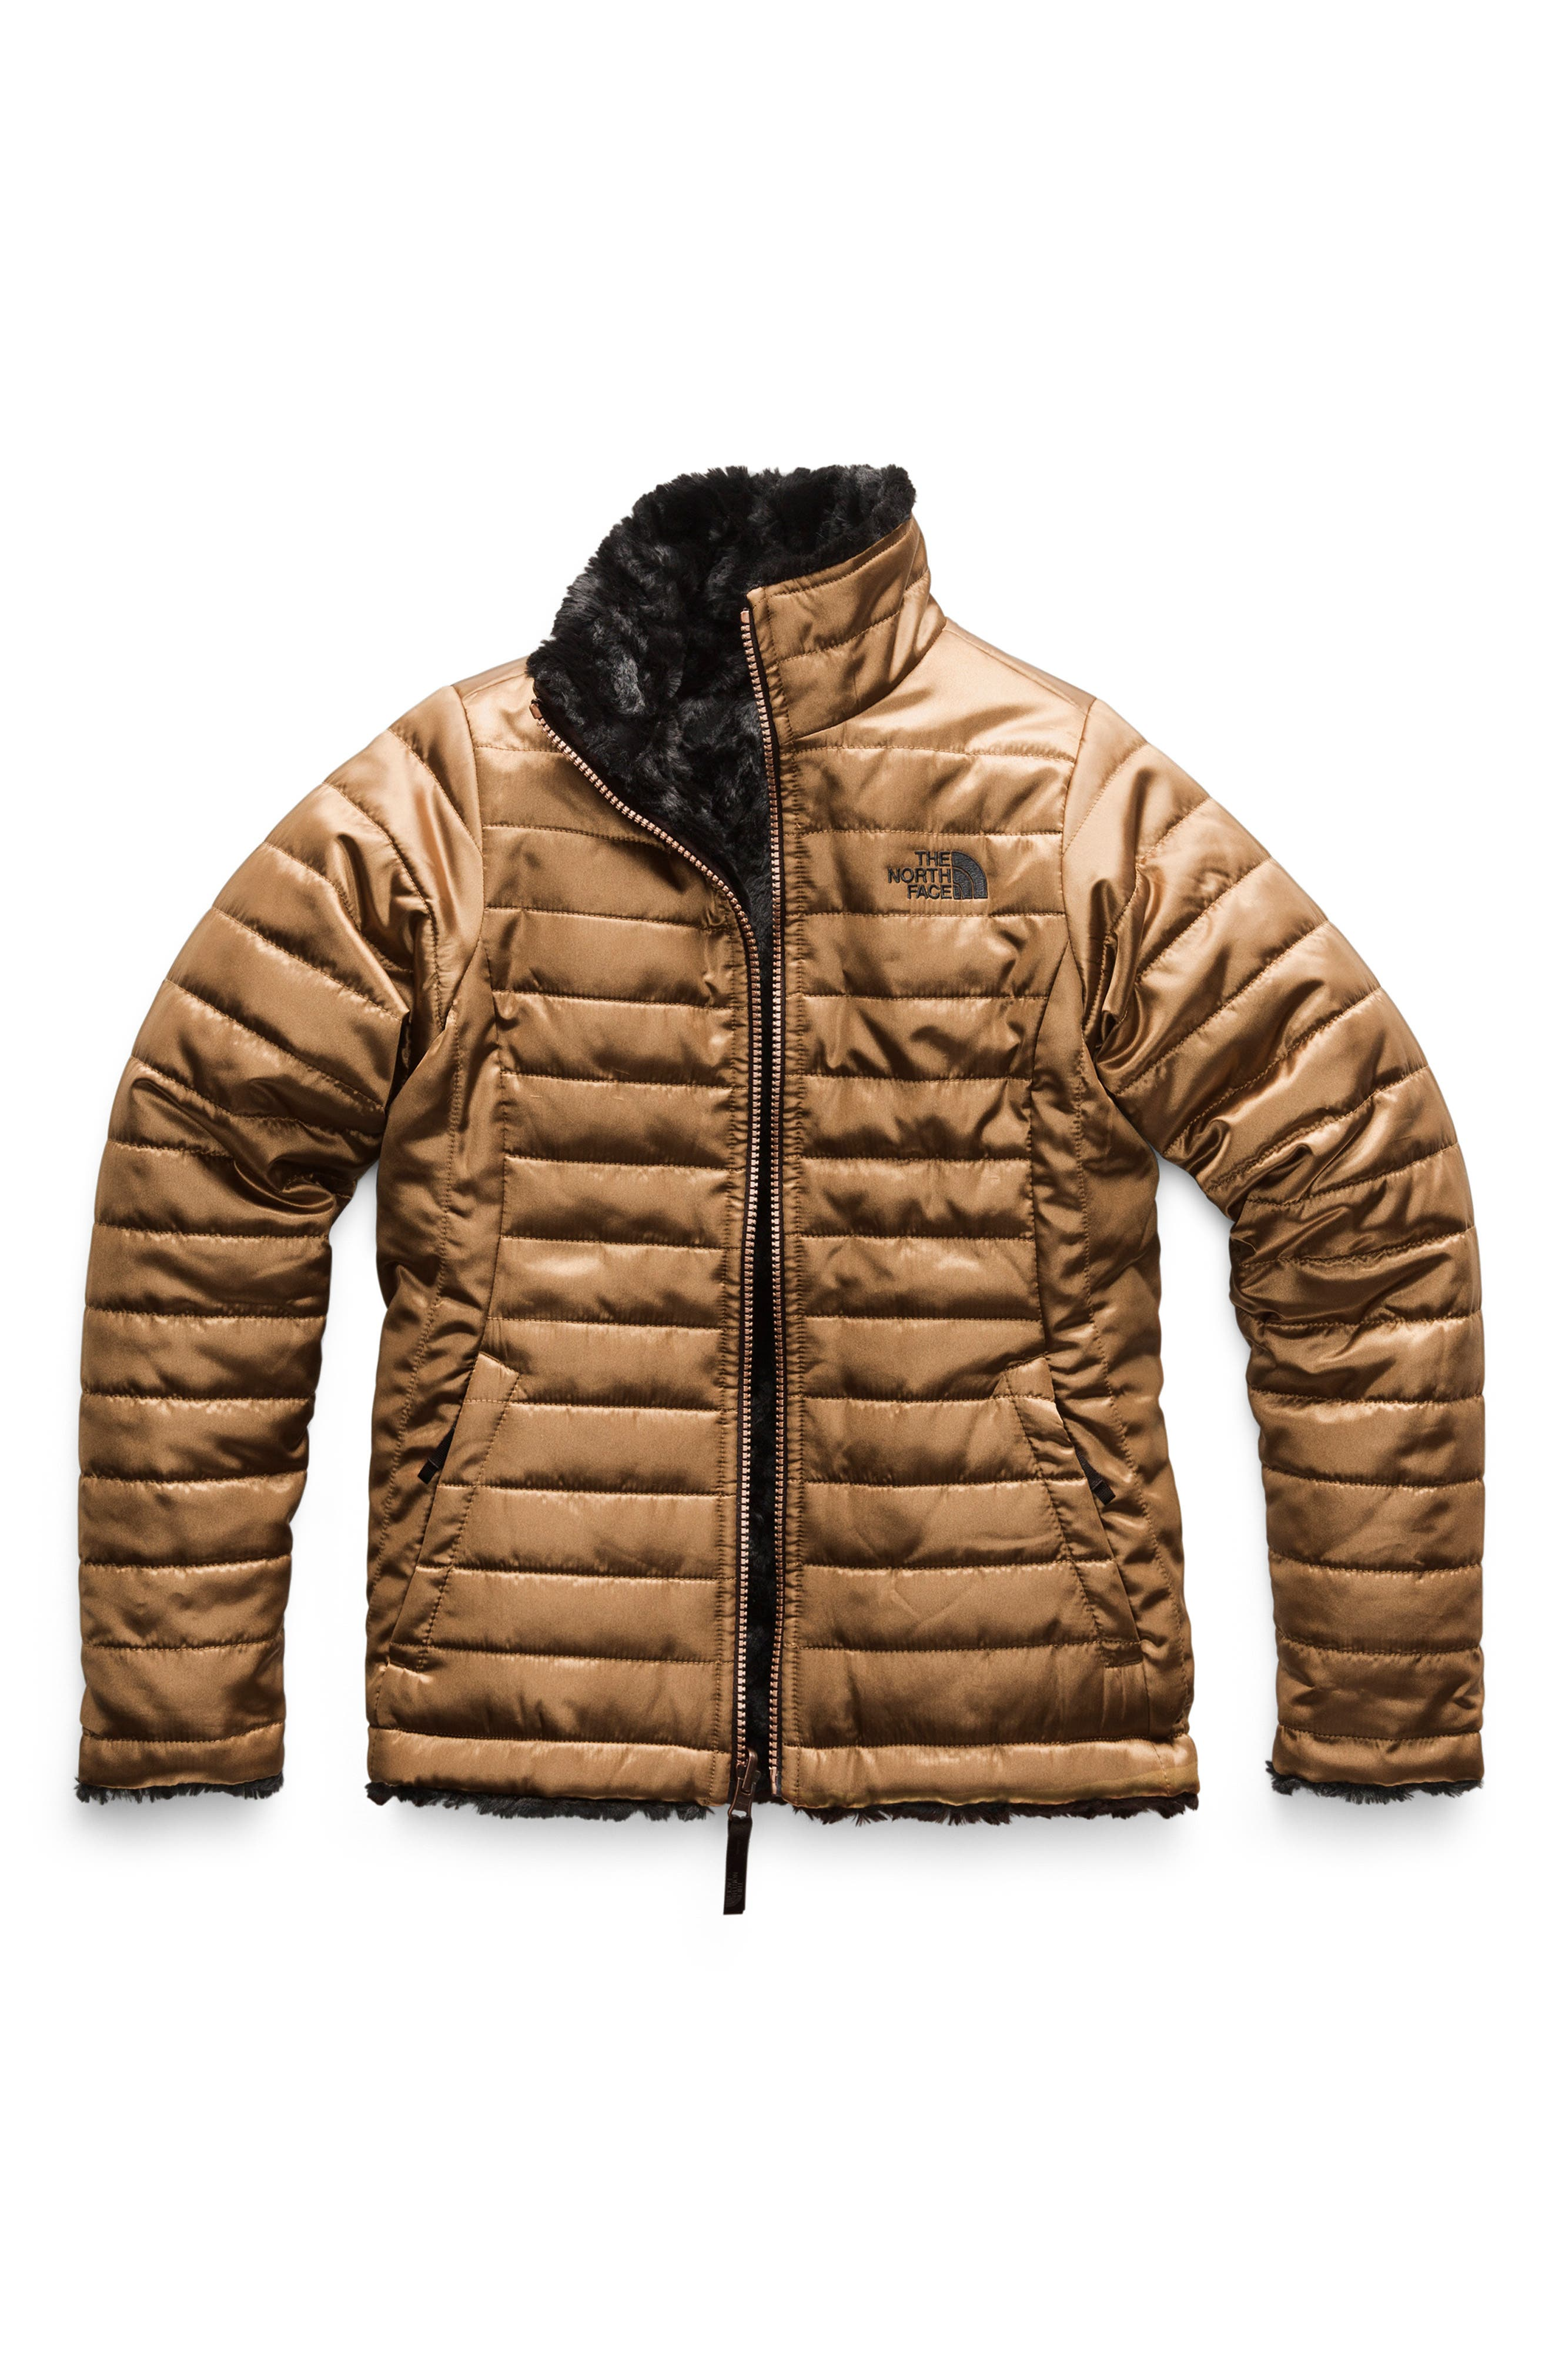 Mossbud Swirl Reversible Water Resistant Jacket,                         Main,                         color, METALLIC COPPER